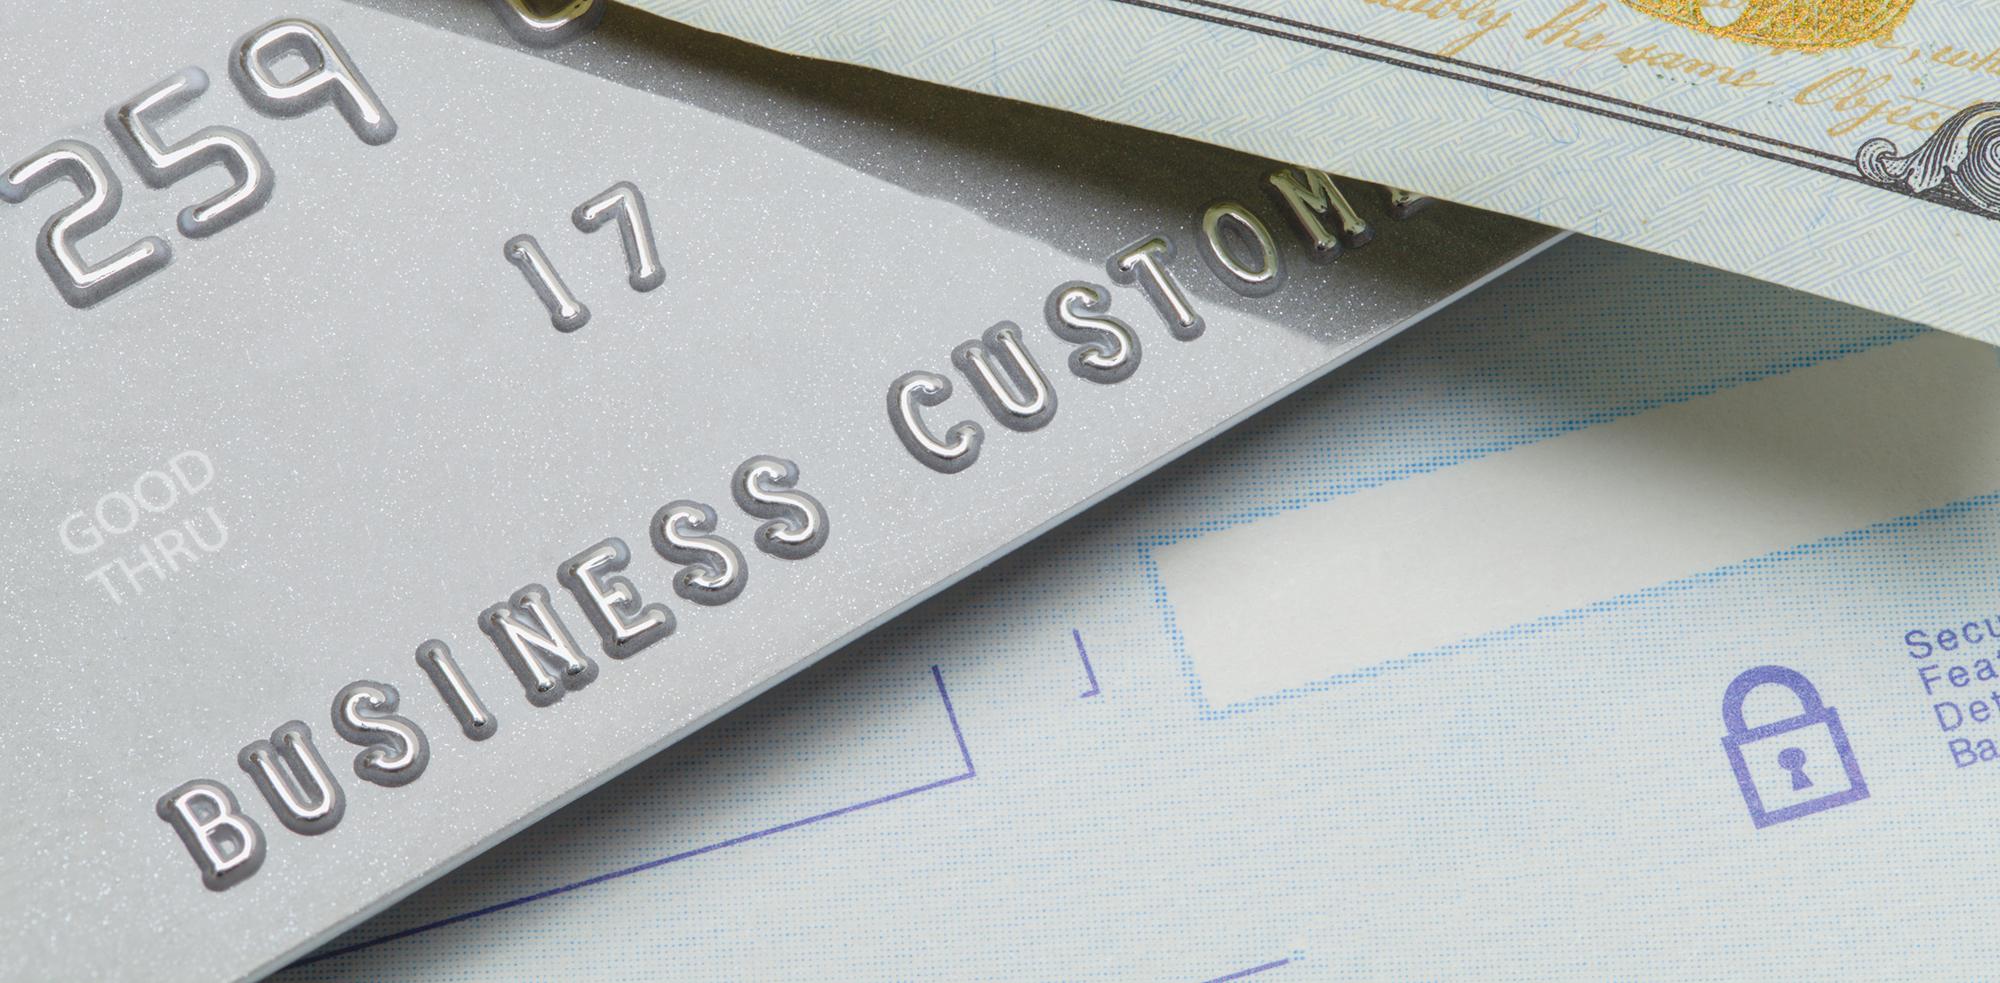 Deferred payment methods